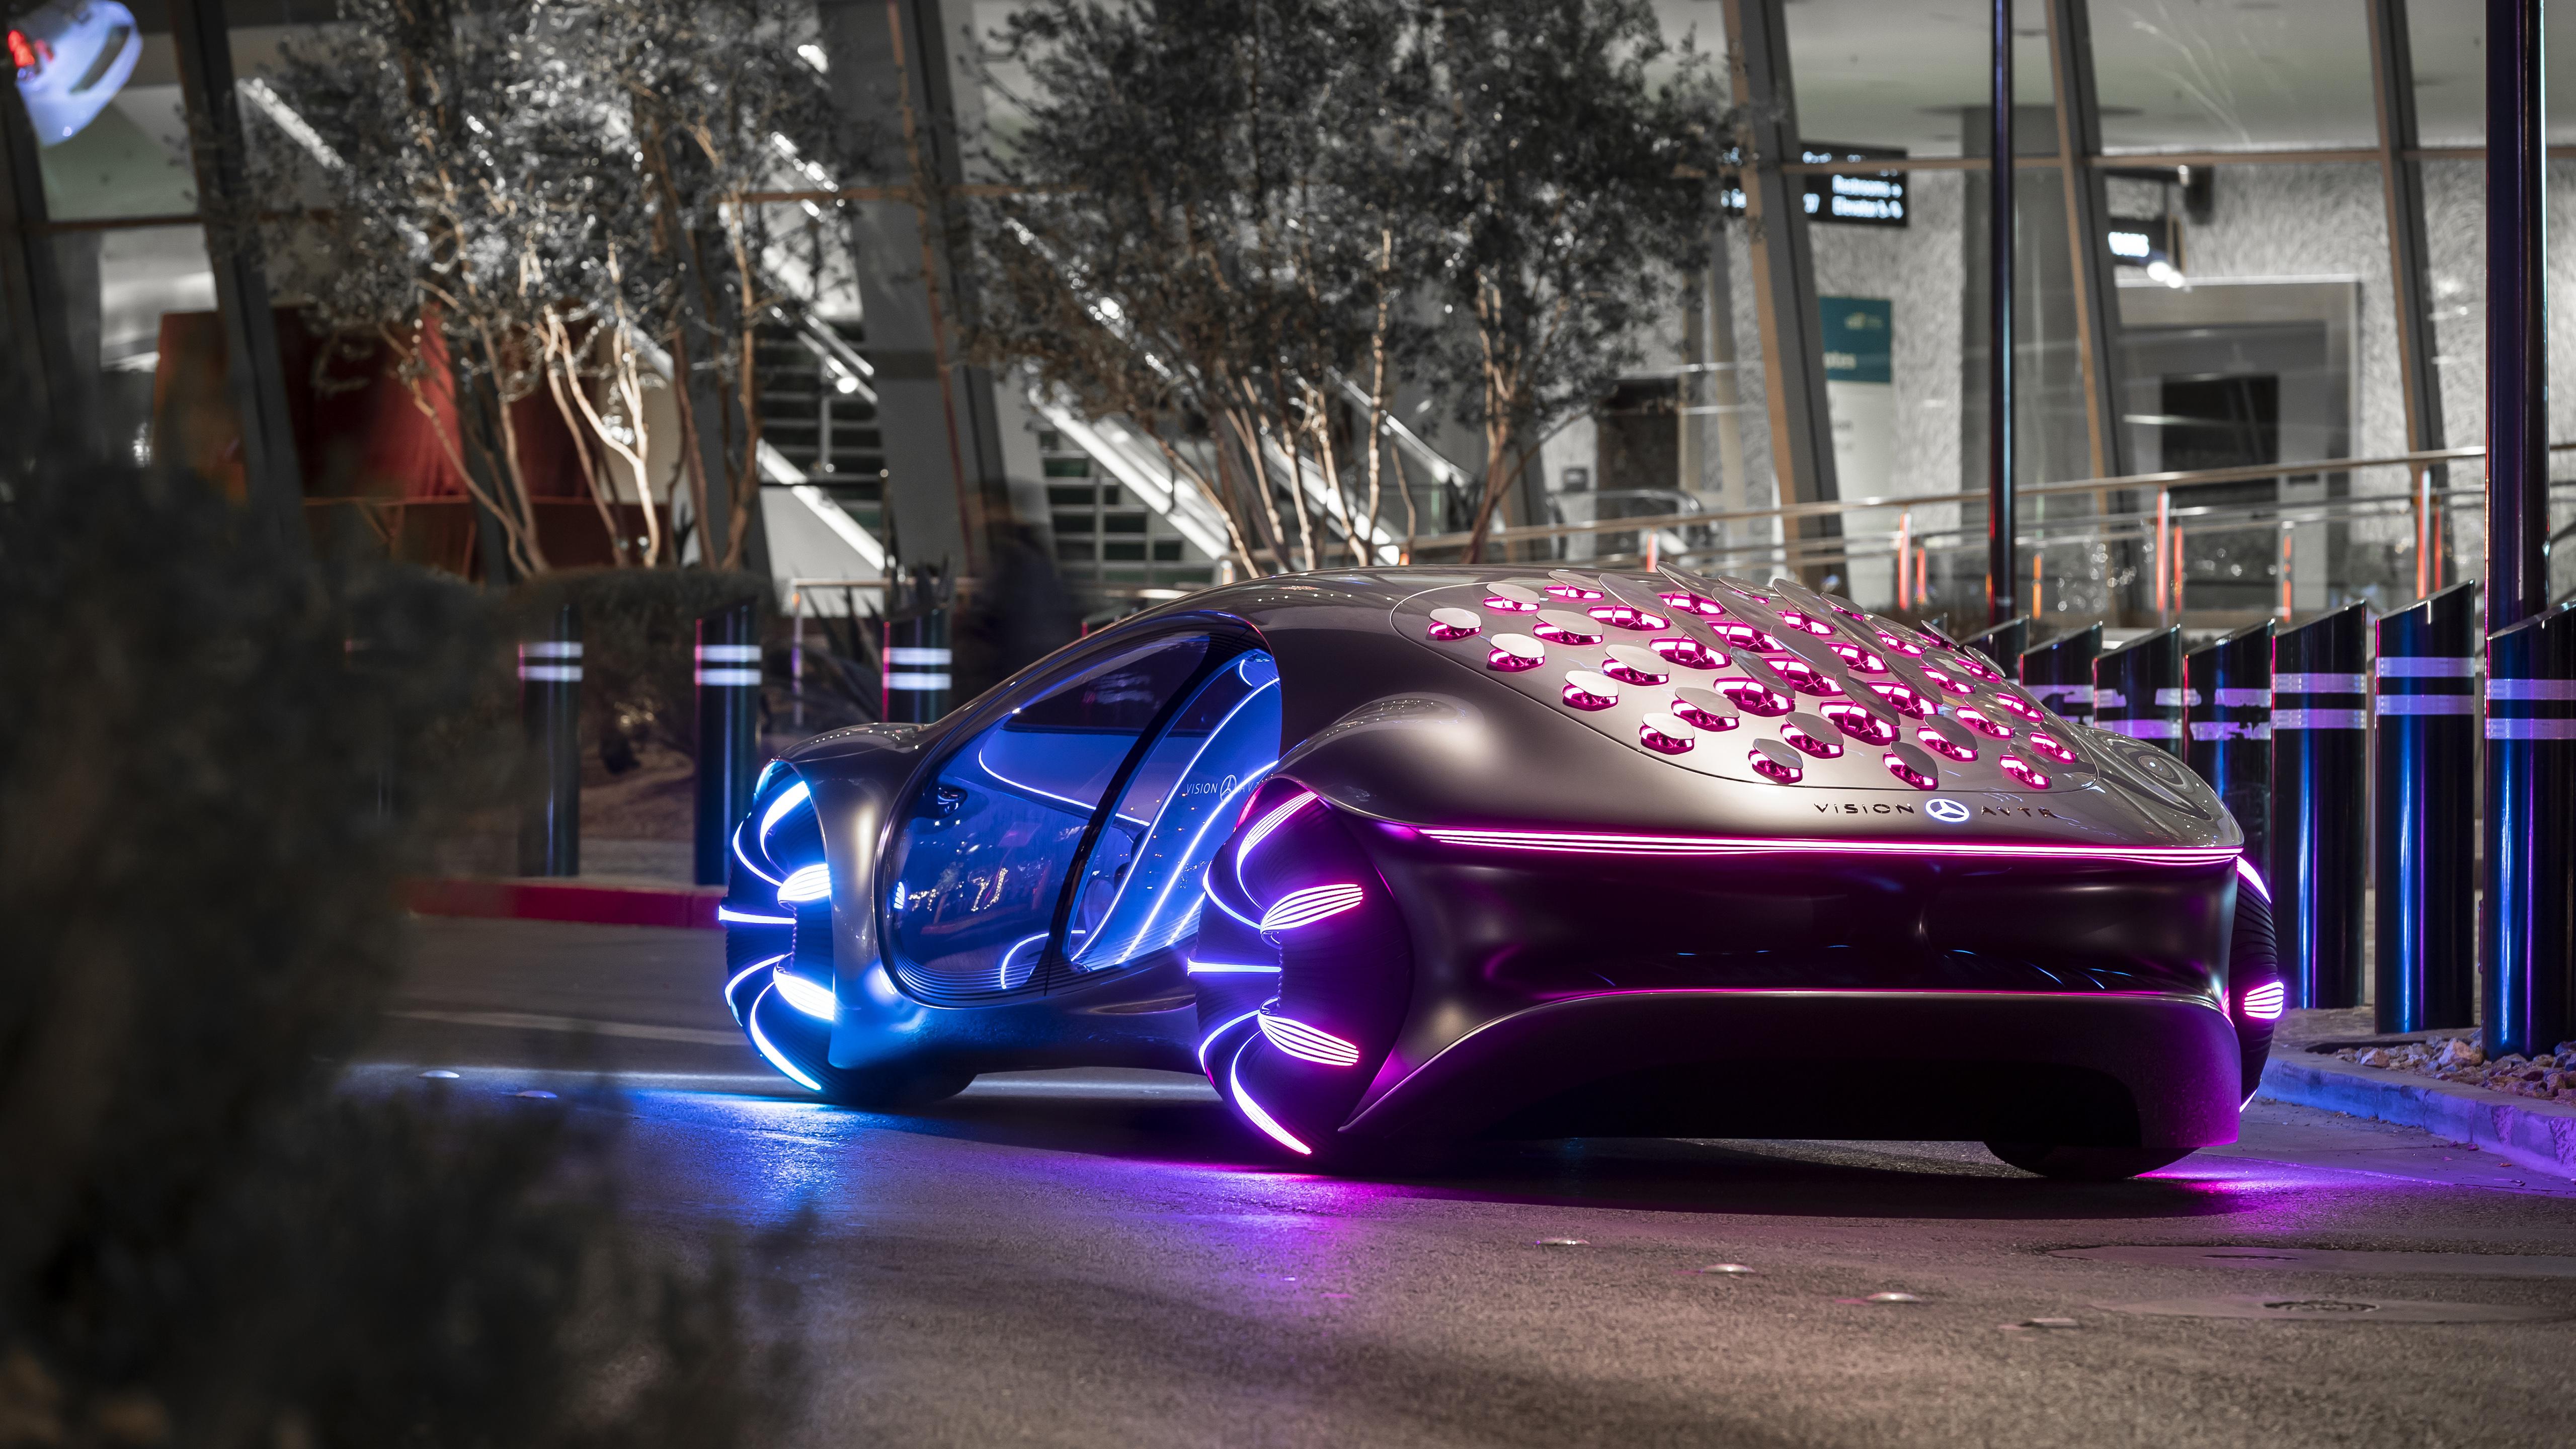 2020 Mercedes Benz VISION AVTR 5K 3 Wallpaper HD Car Wallpapers 5120x2880